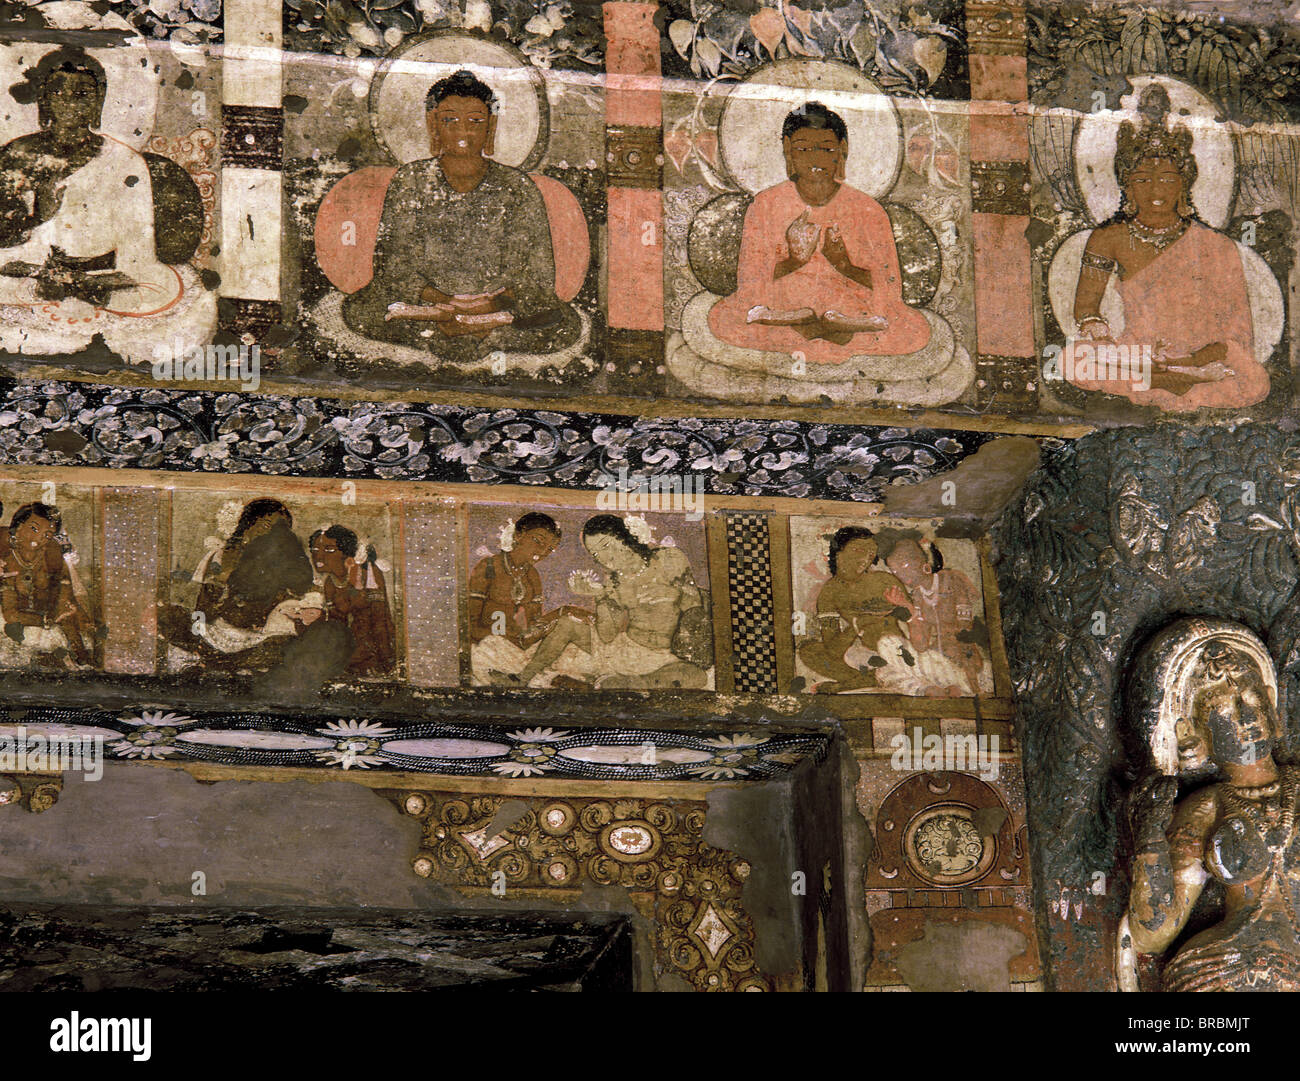 Detail of mural in Buddhist Cave No. 2, Ajanta, UNESCO World Heritage Site, Maharashtra, India - Stock Image